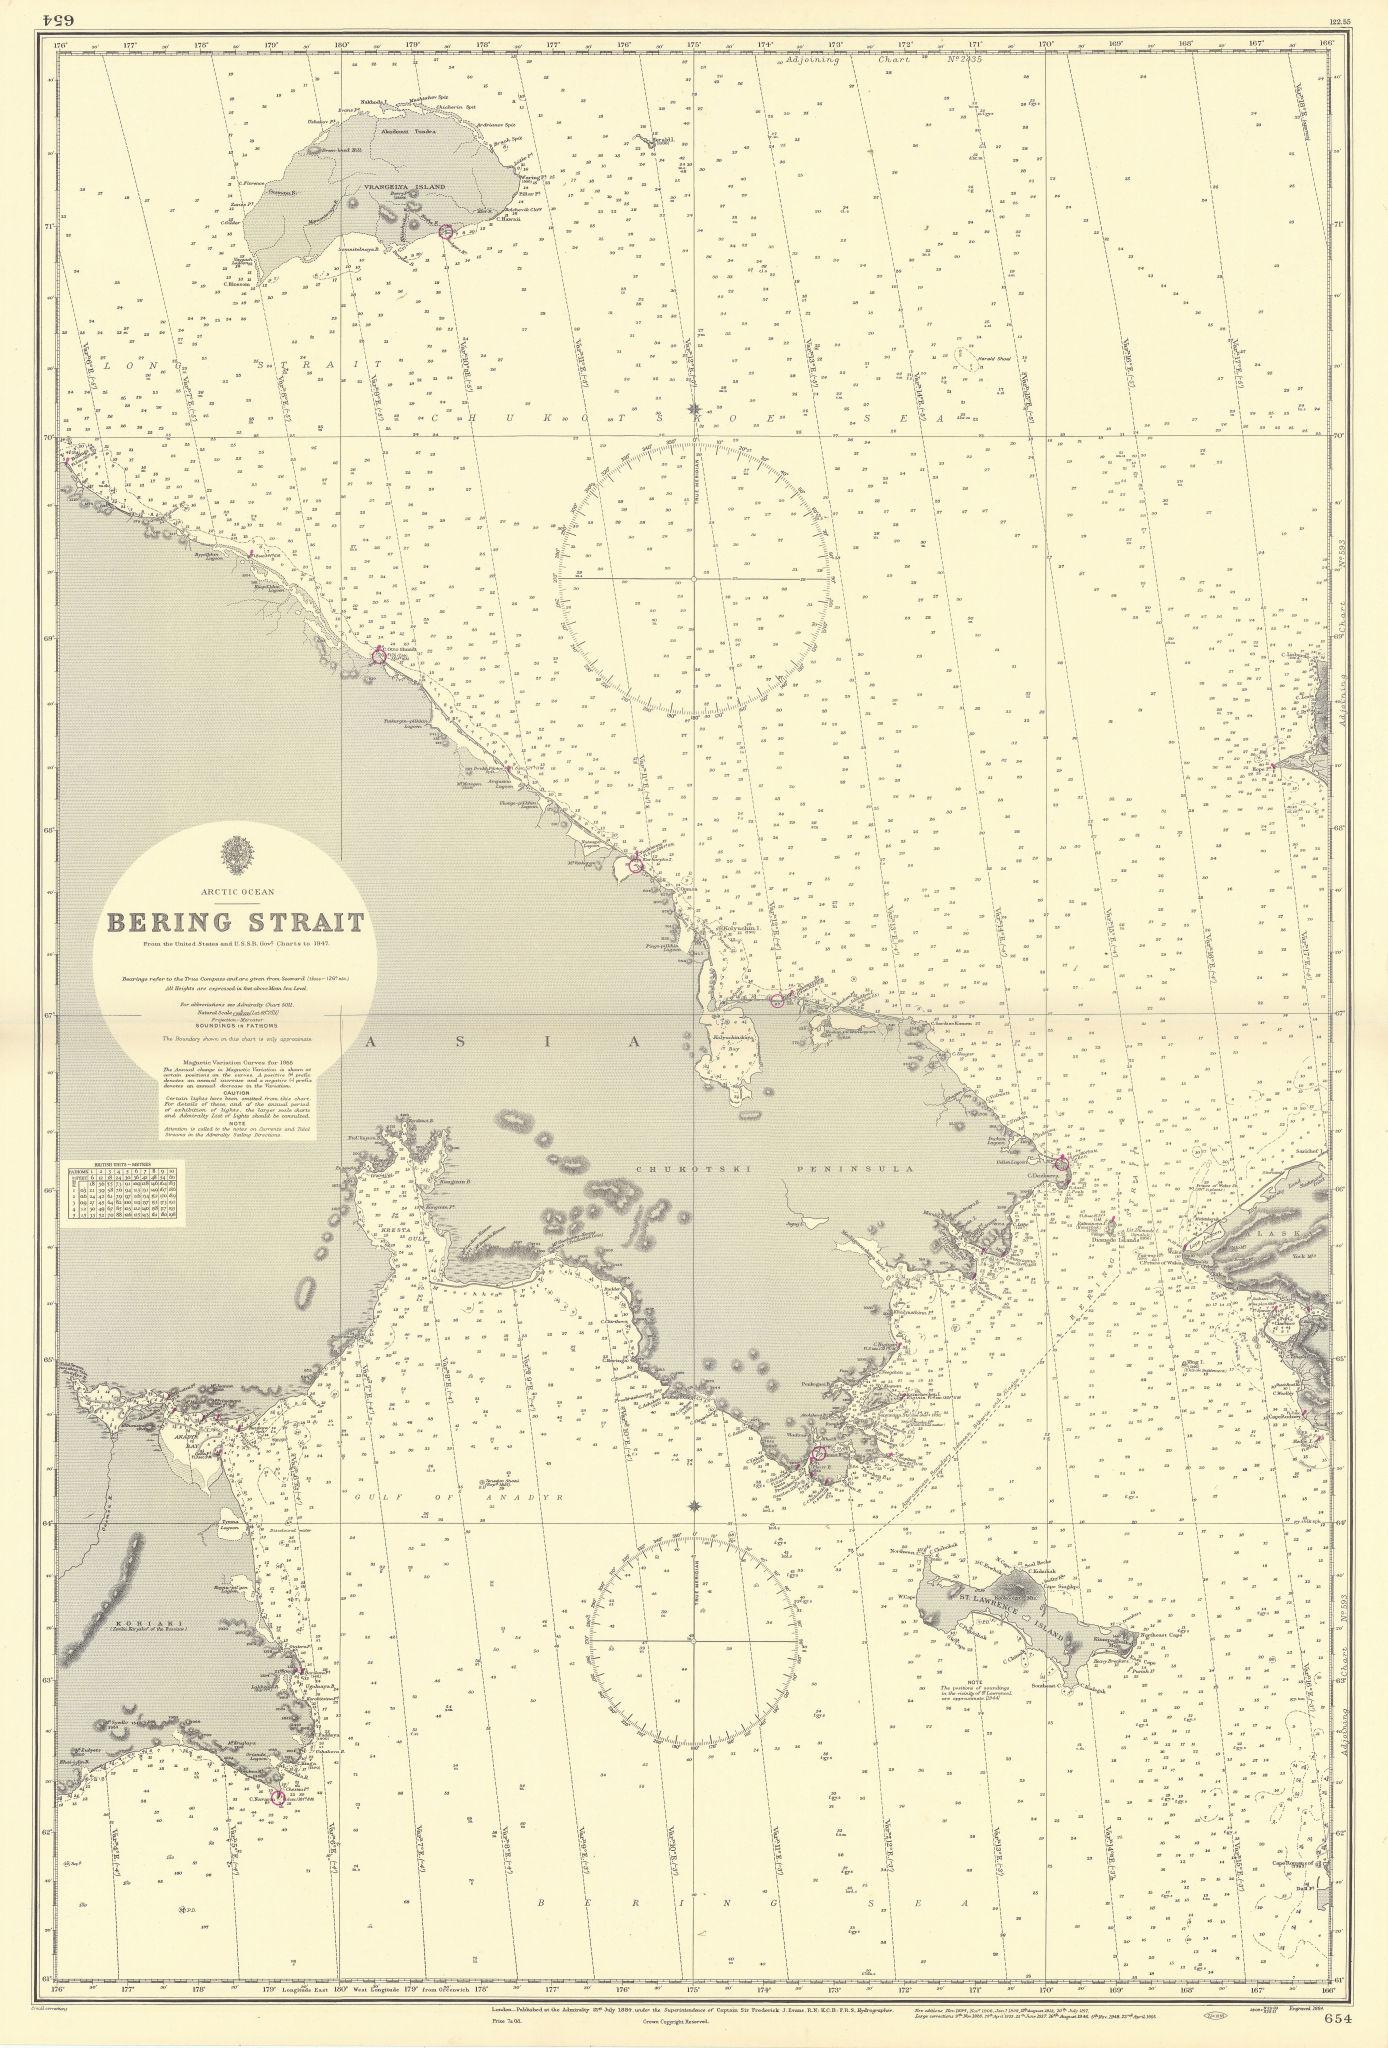 Bering Strait, Arctic Ocean. Russia Alaska. ADMIRALTY sea chart 1884 (1955) map